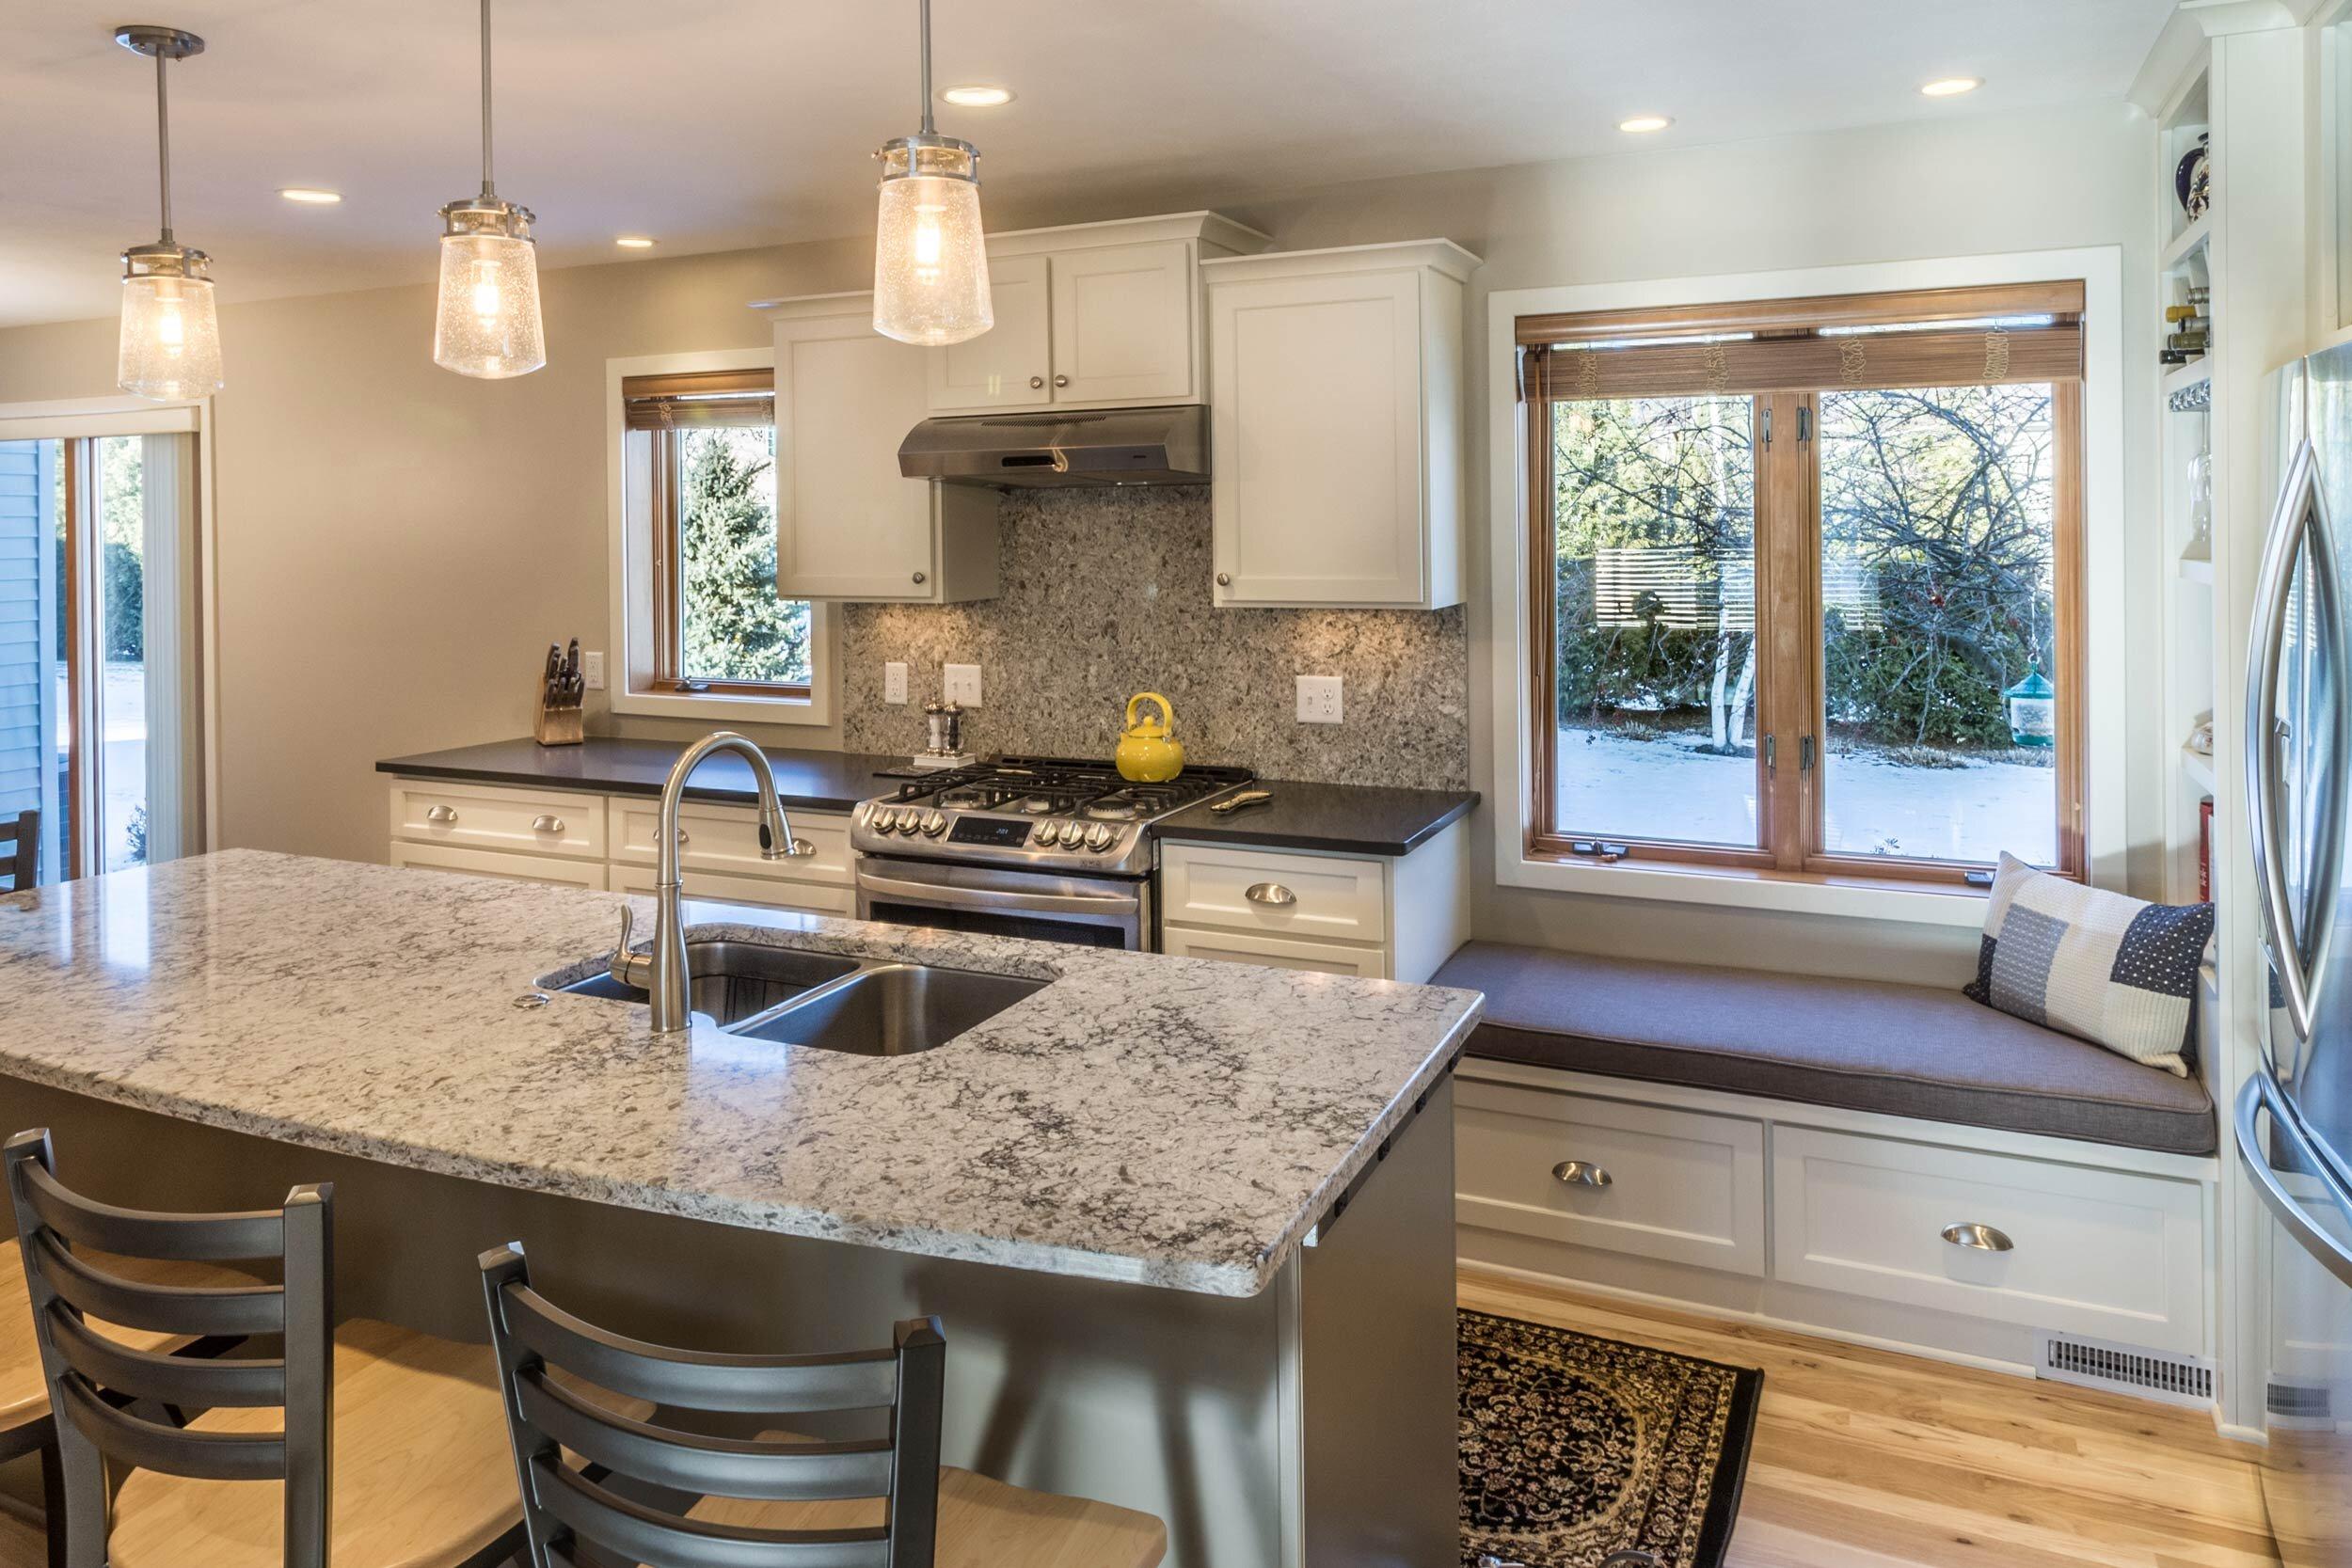 Four Easy To Clean Non Tile Kitchen Backsplash Ideas Degnan Design Build Remodel